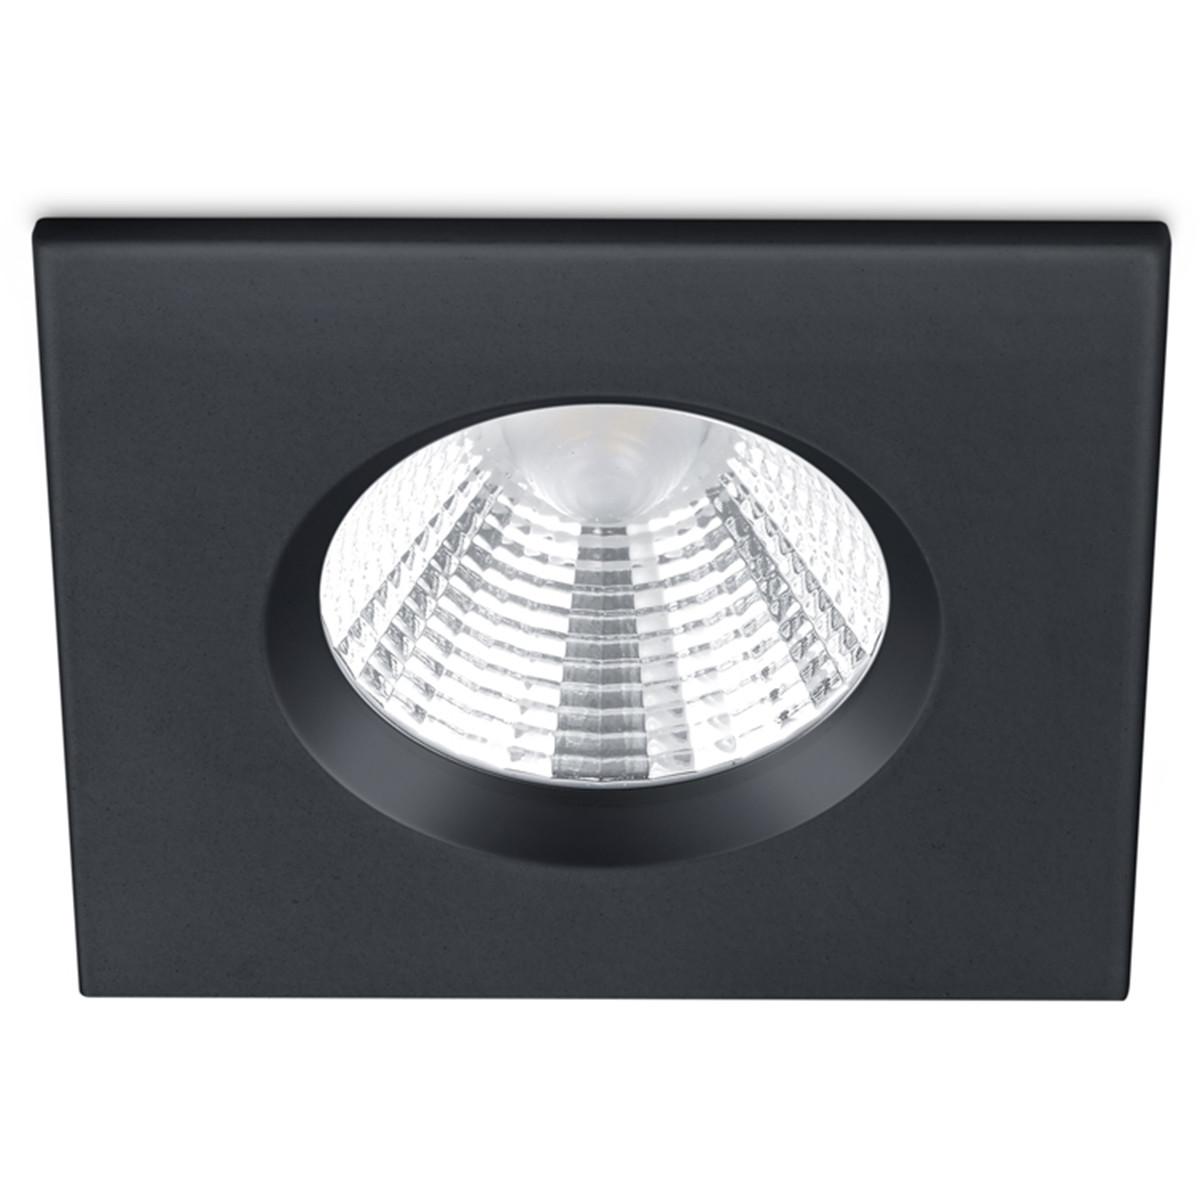 LED Spot - Inbouwspot - Trion Zagrona - 5W - Waterdicht IP65 - Dimbaar - Warm Wit 3000K - Mat Zwart